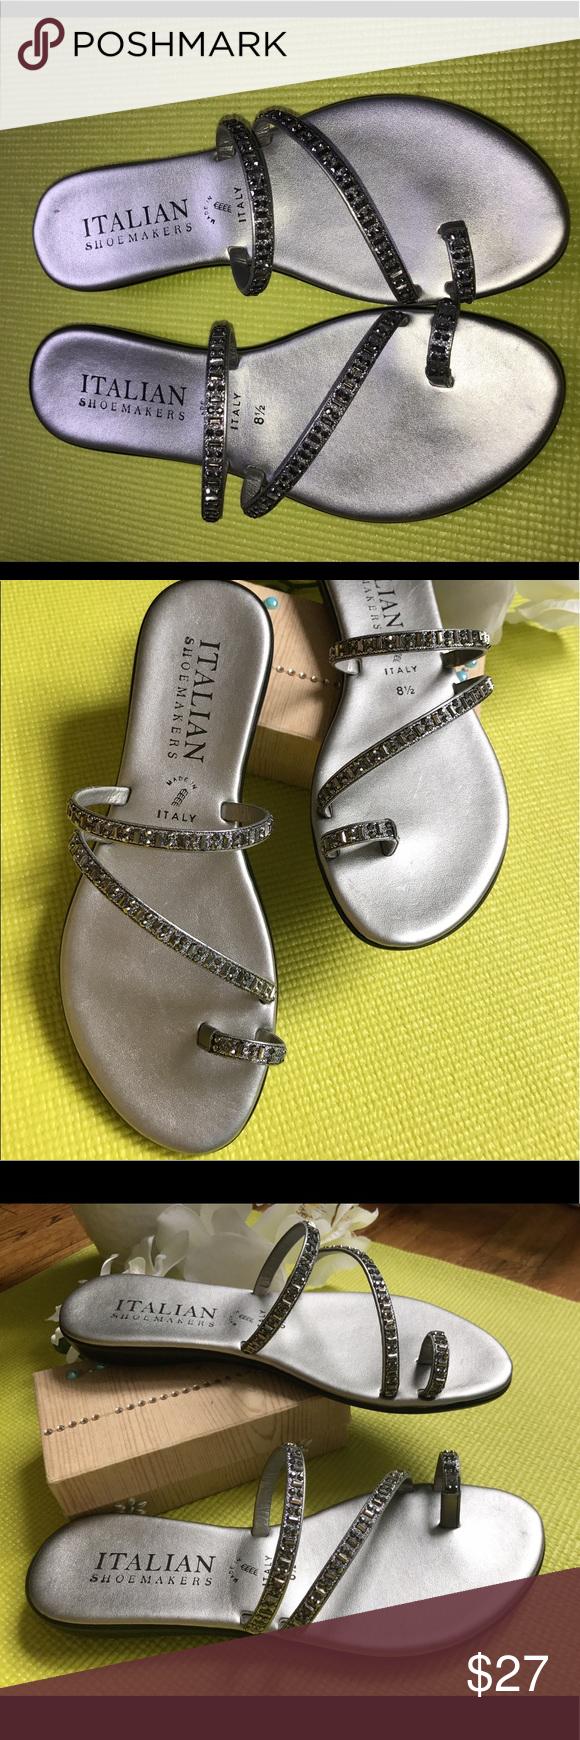 6ec540c20ce093 ITALIAN SHOEMAKERS Evita Toe Ring Sandal ITALIAN SHOEMAKERS Made In Italy  Evita Toe Ring Sandal Pewter